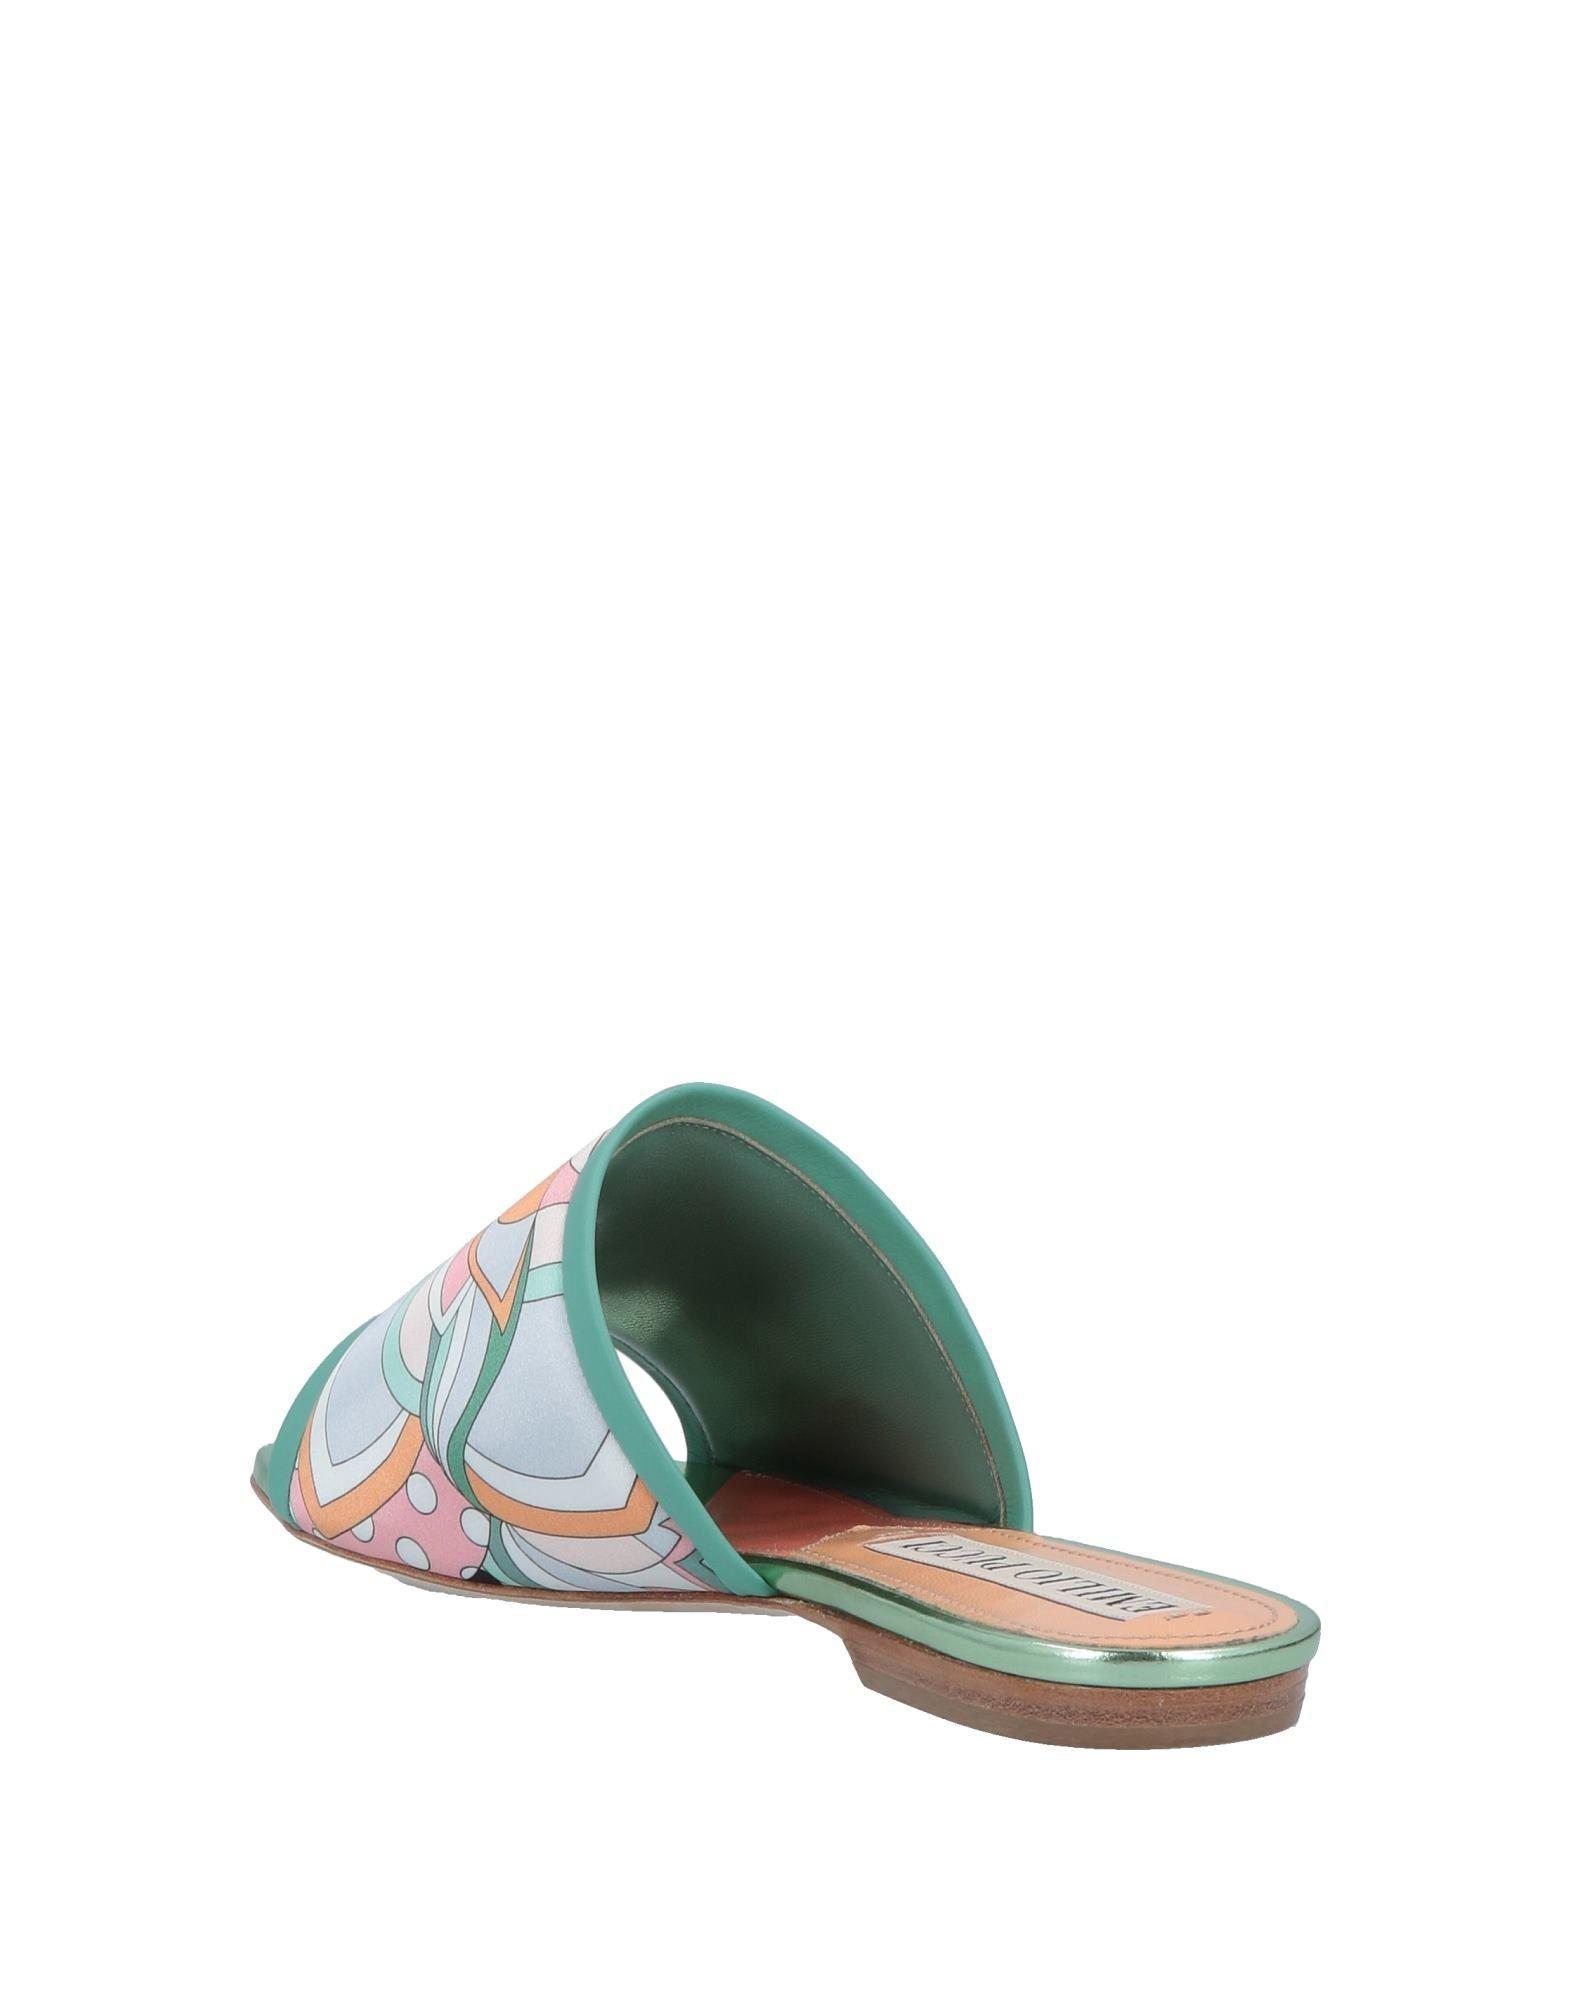 Lyst Pucci Green Emilio In Sandals L4j5AR